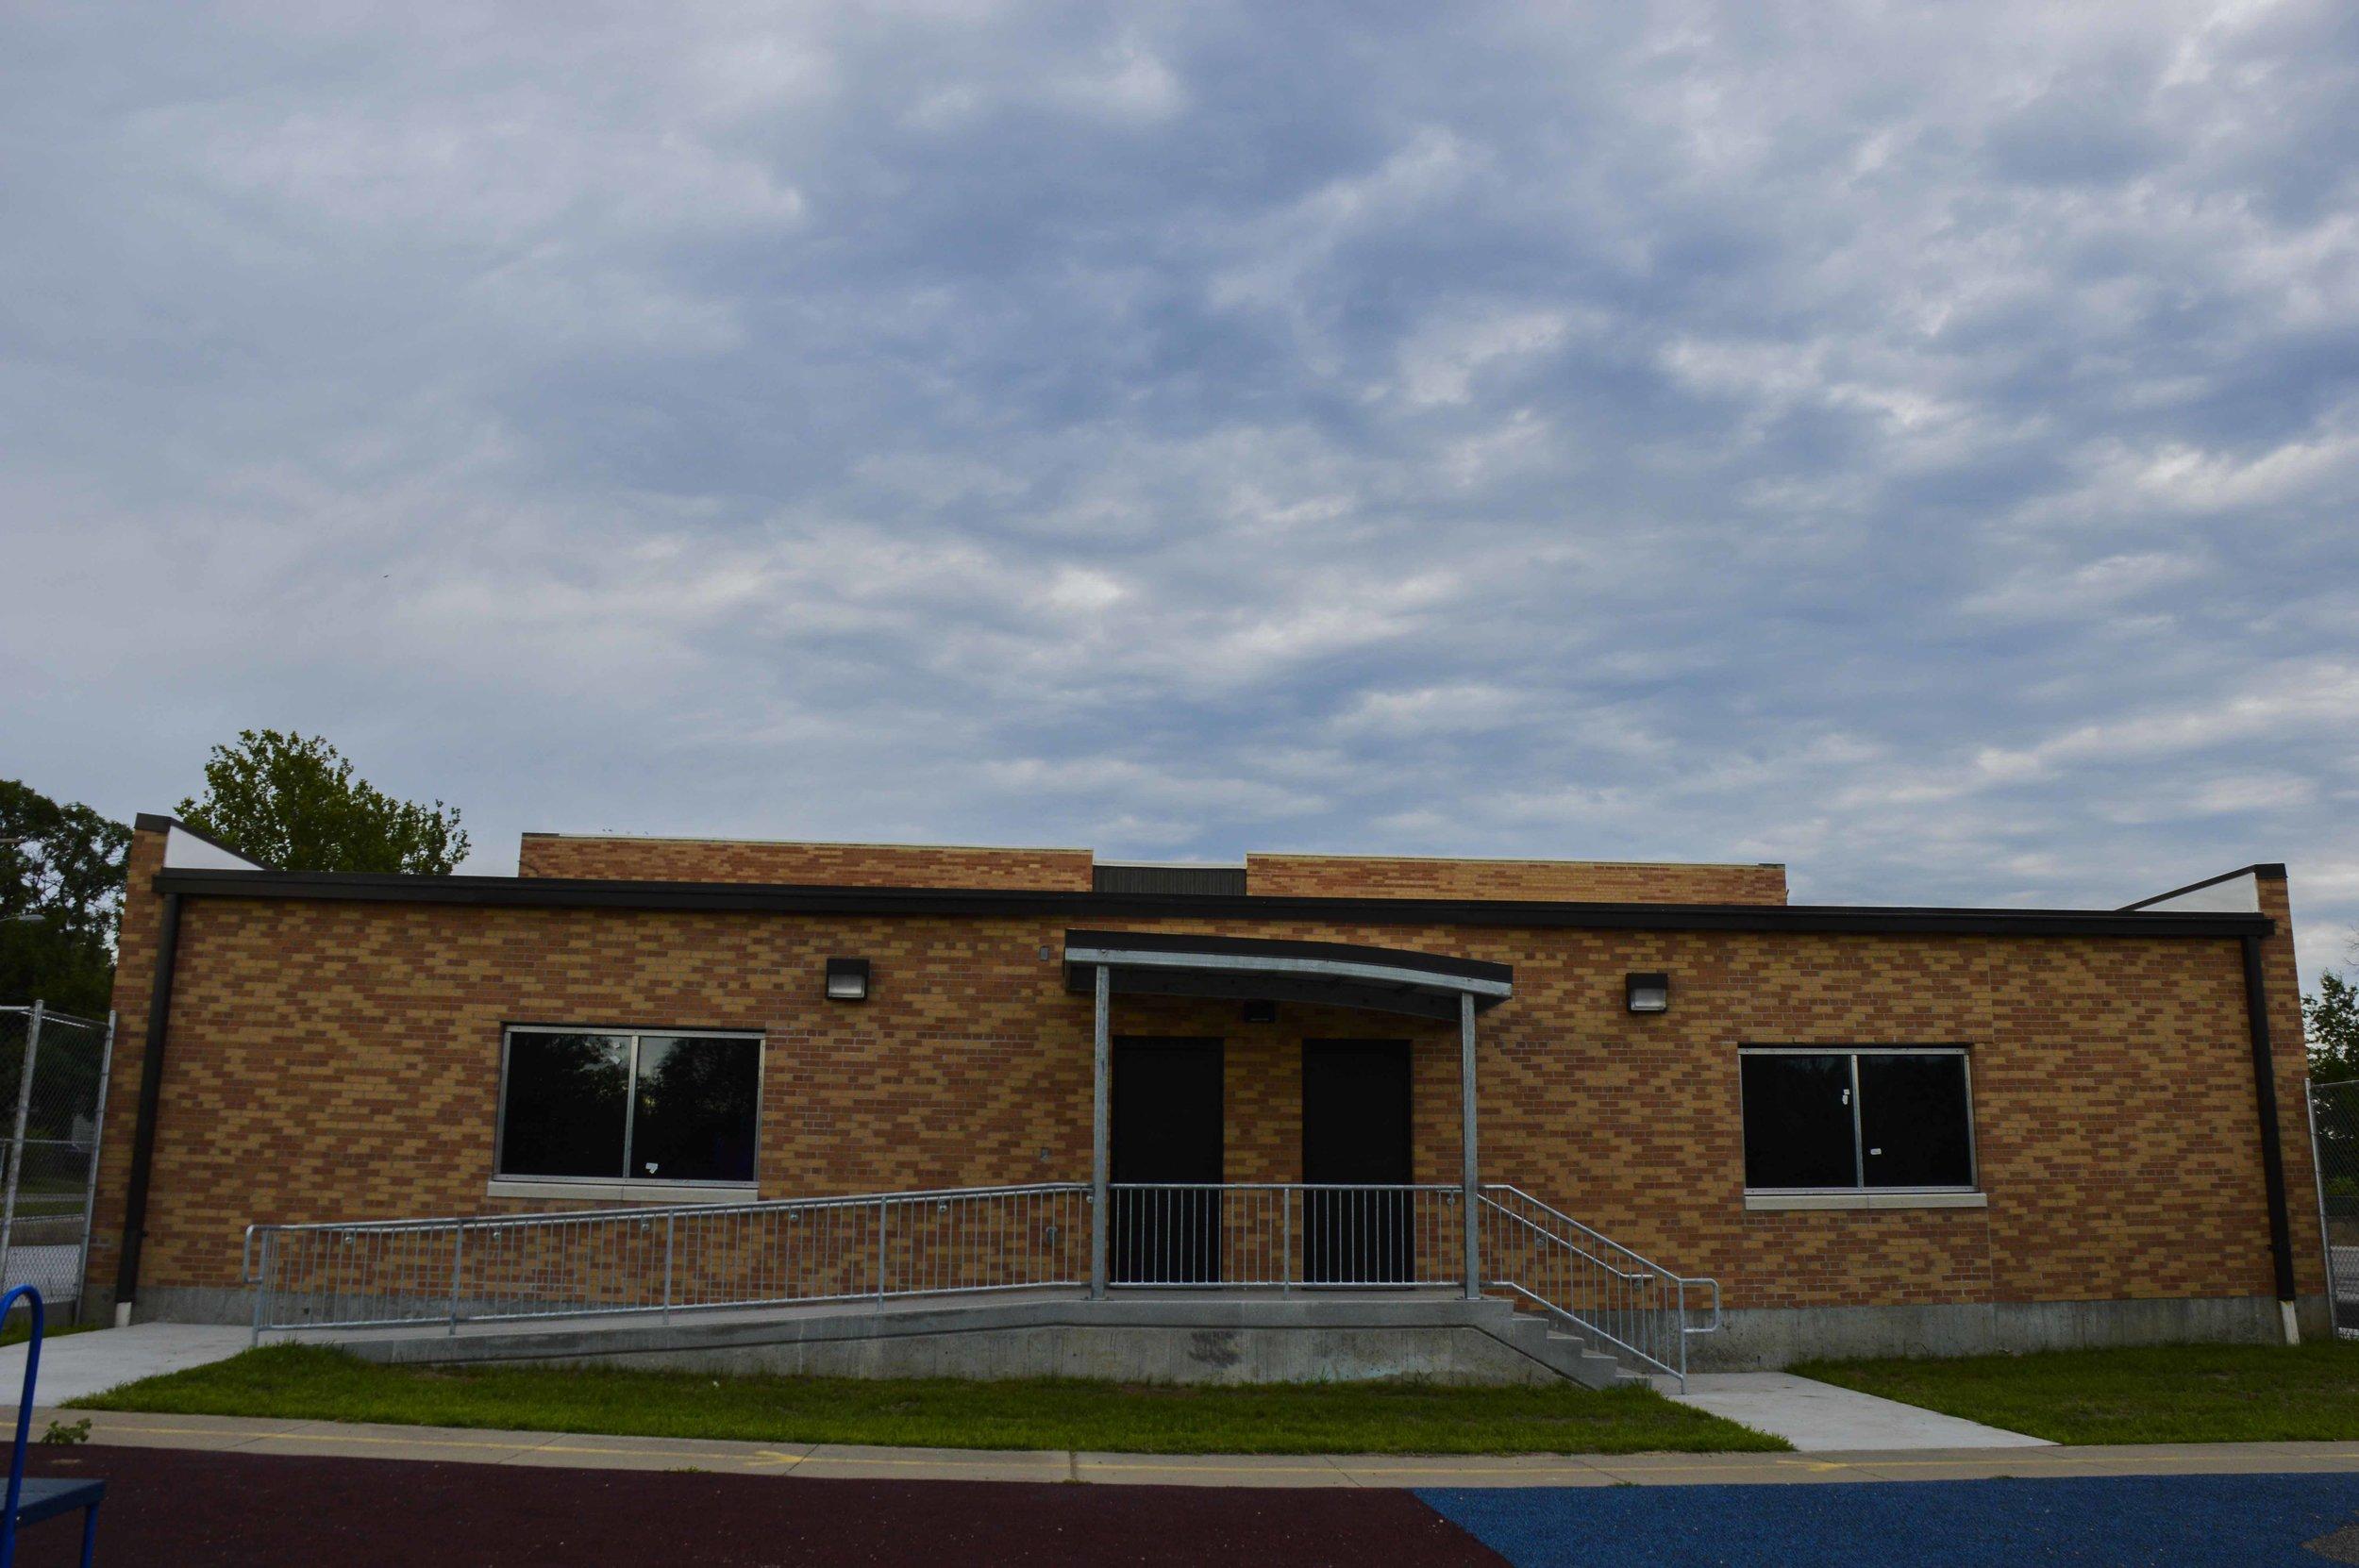 Sheldon Head Start   Client: USD 501 Topeka Public Schools Architect: Peterson Architecture